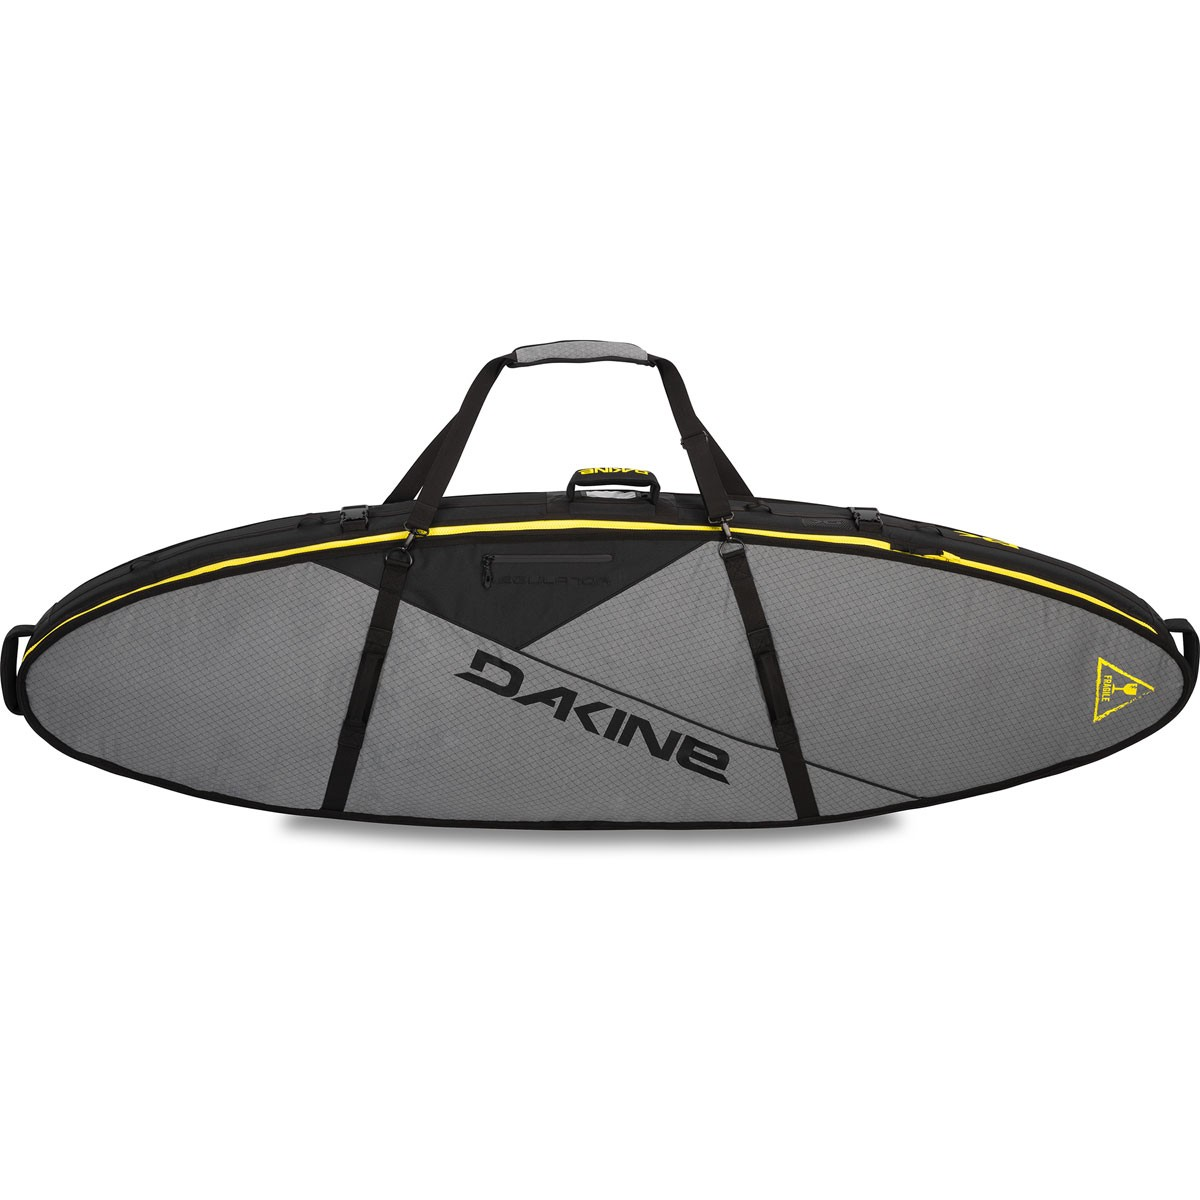 DAKINE(ダカイン)サーフボードケース REGULATOR SURFBOARD BAG - TRIPLE 6'6